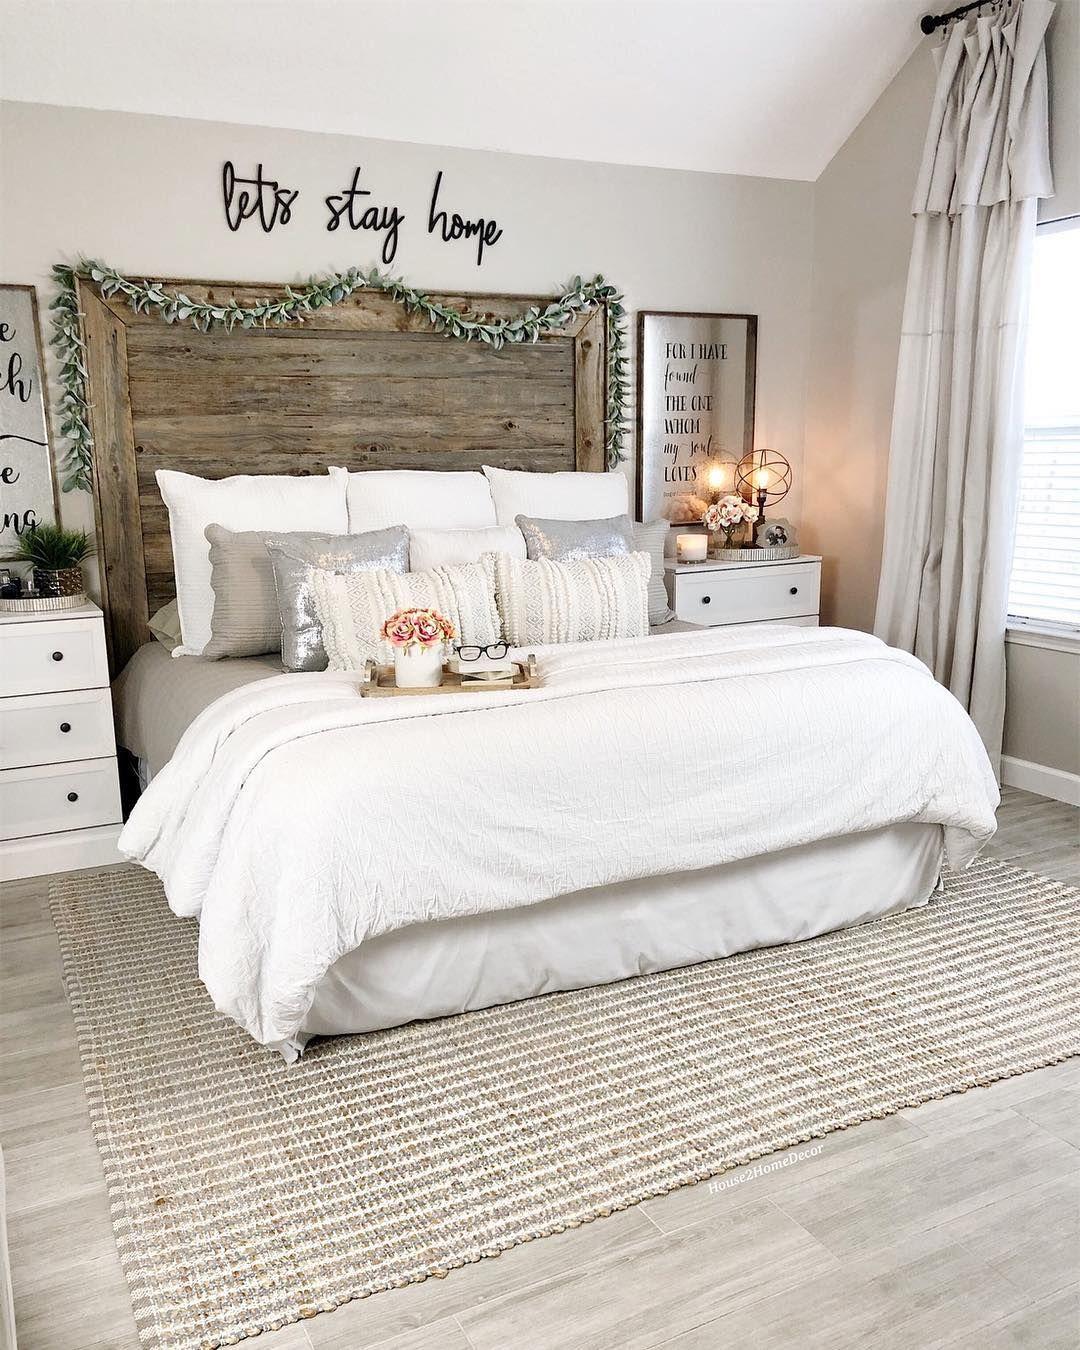 10 Most Popular Farmhouse Bedroom Design And Decor Ideas